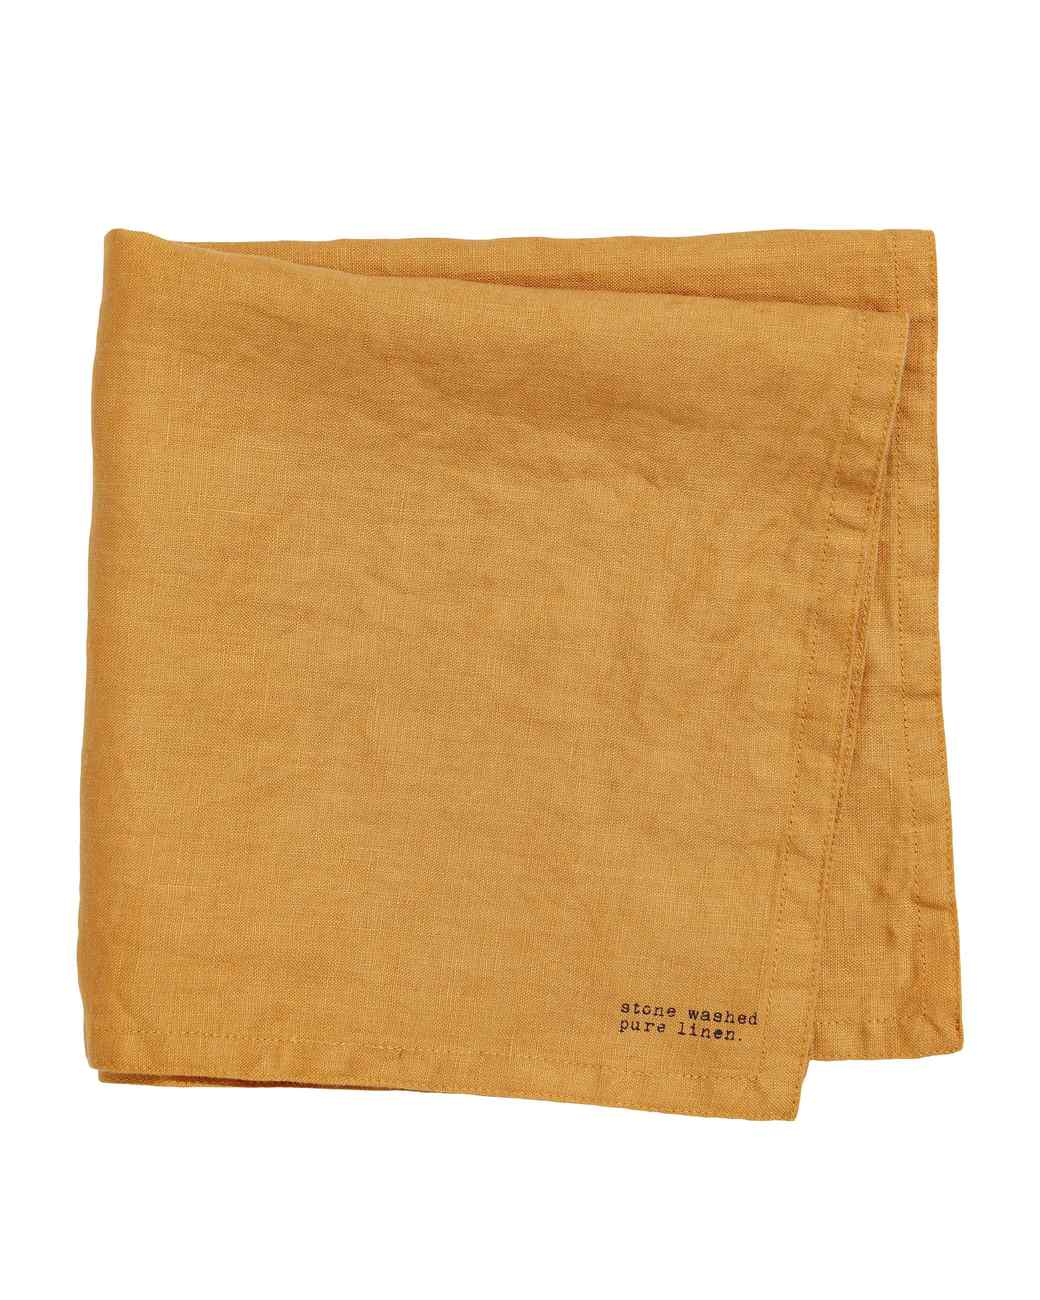 hm napkin